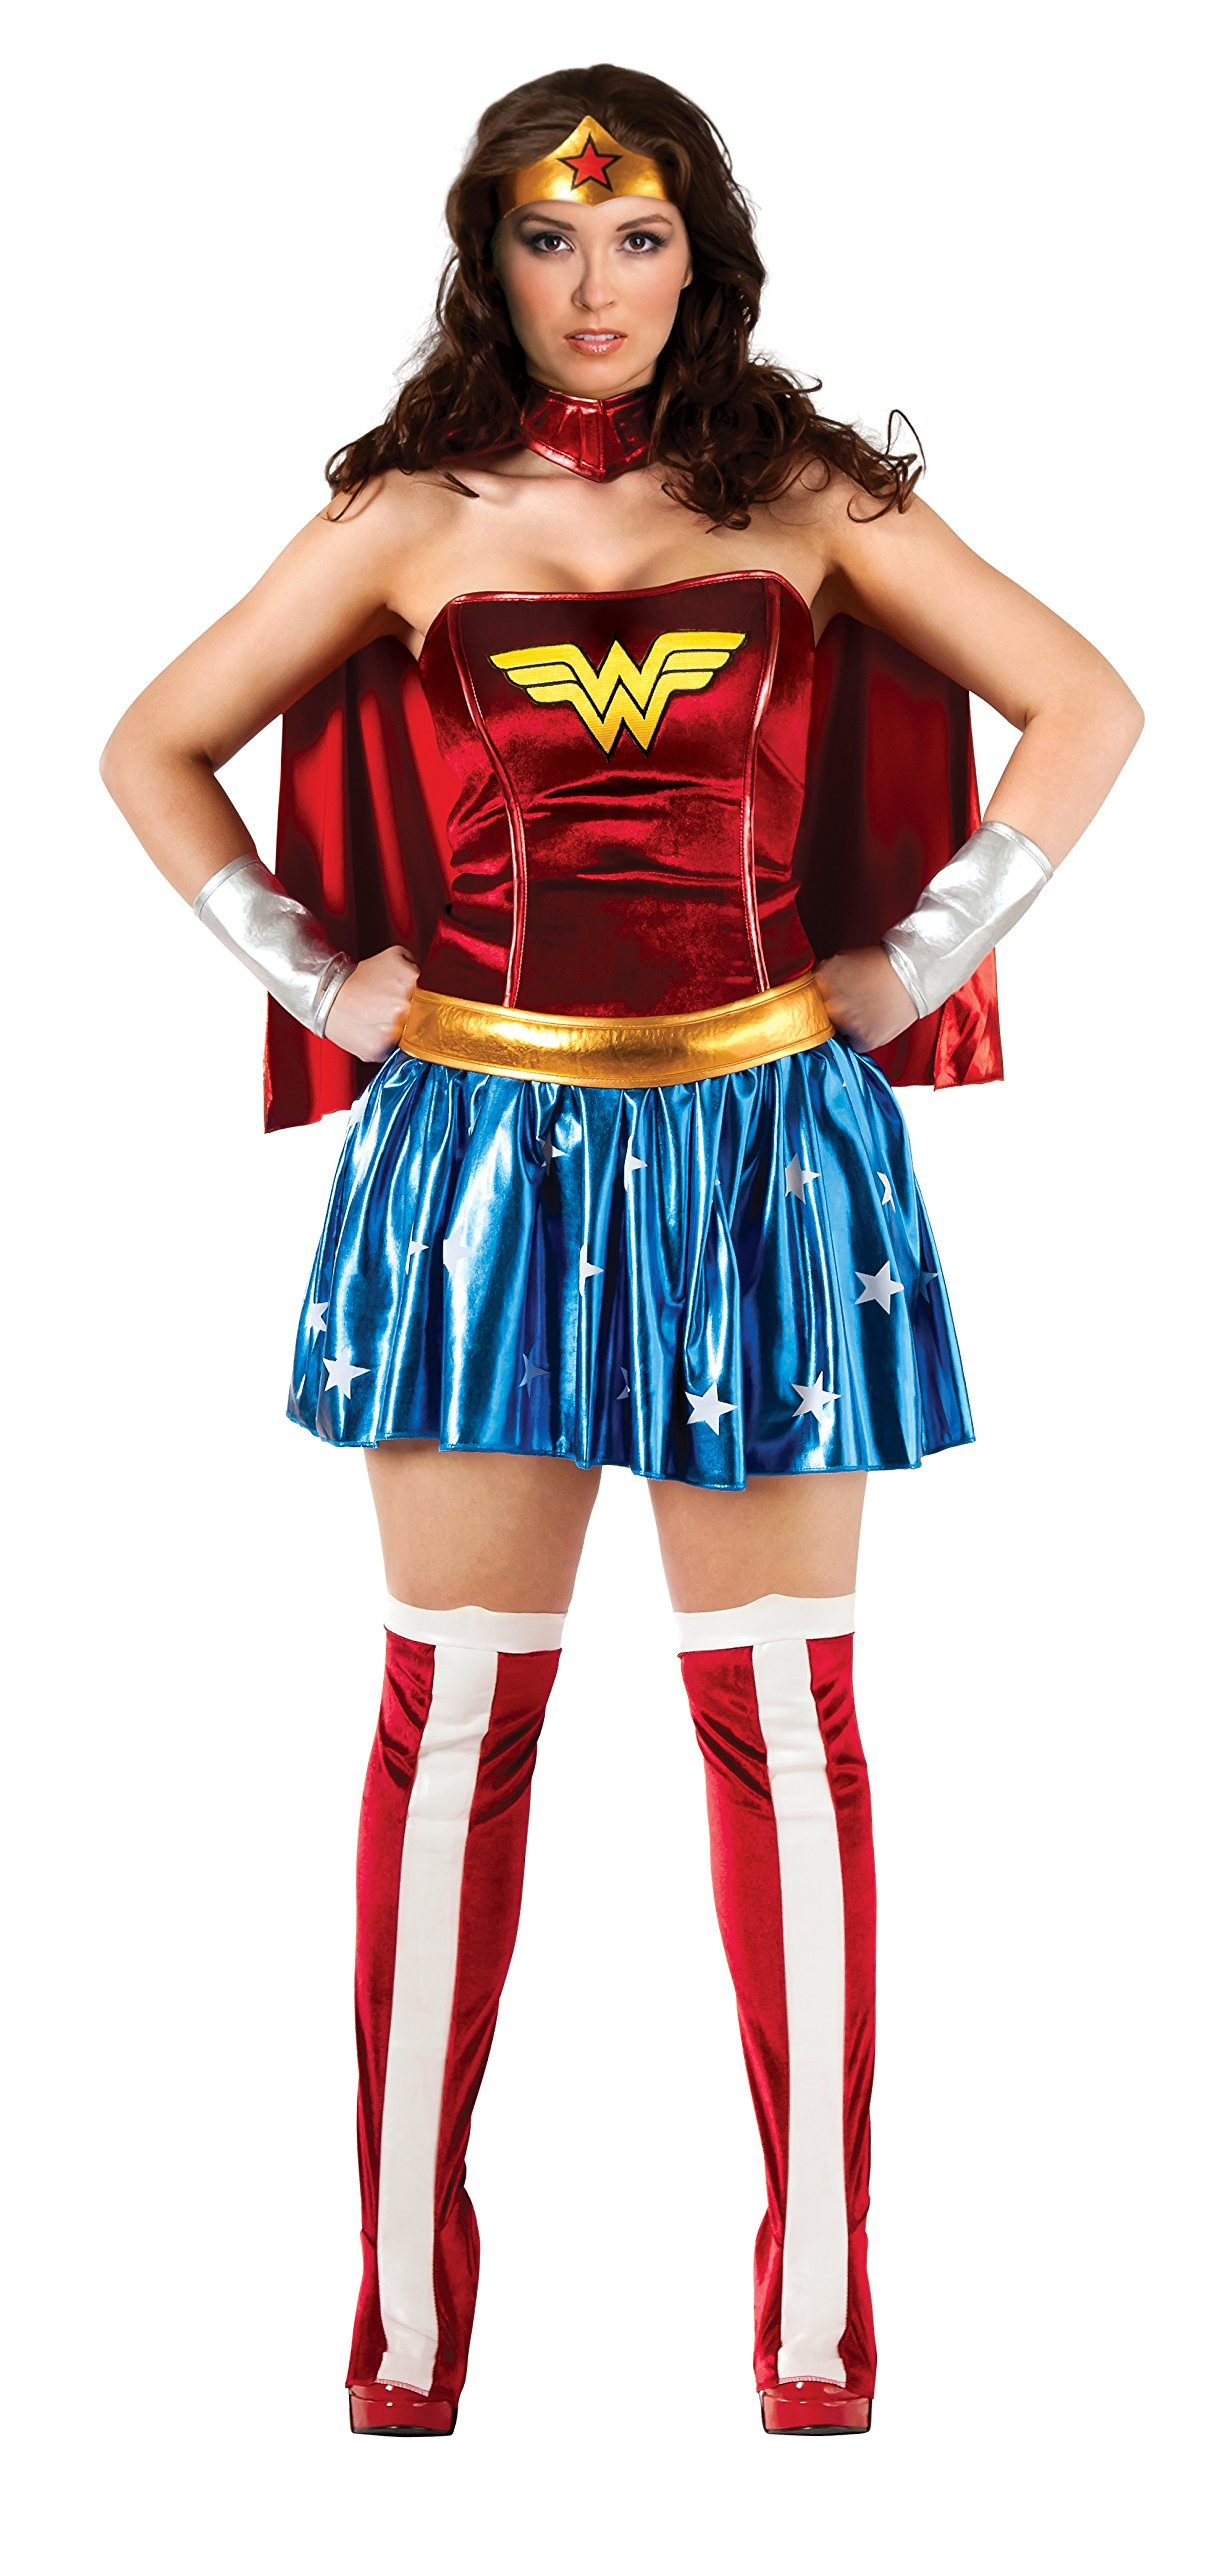 DC Comics Full Figure Wonder Woman Costume by Rubie's (Image #2)